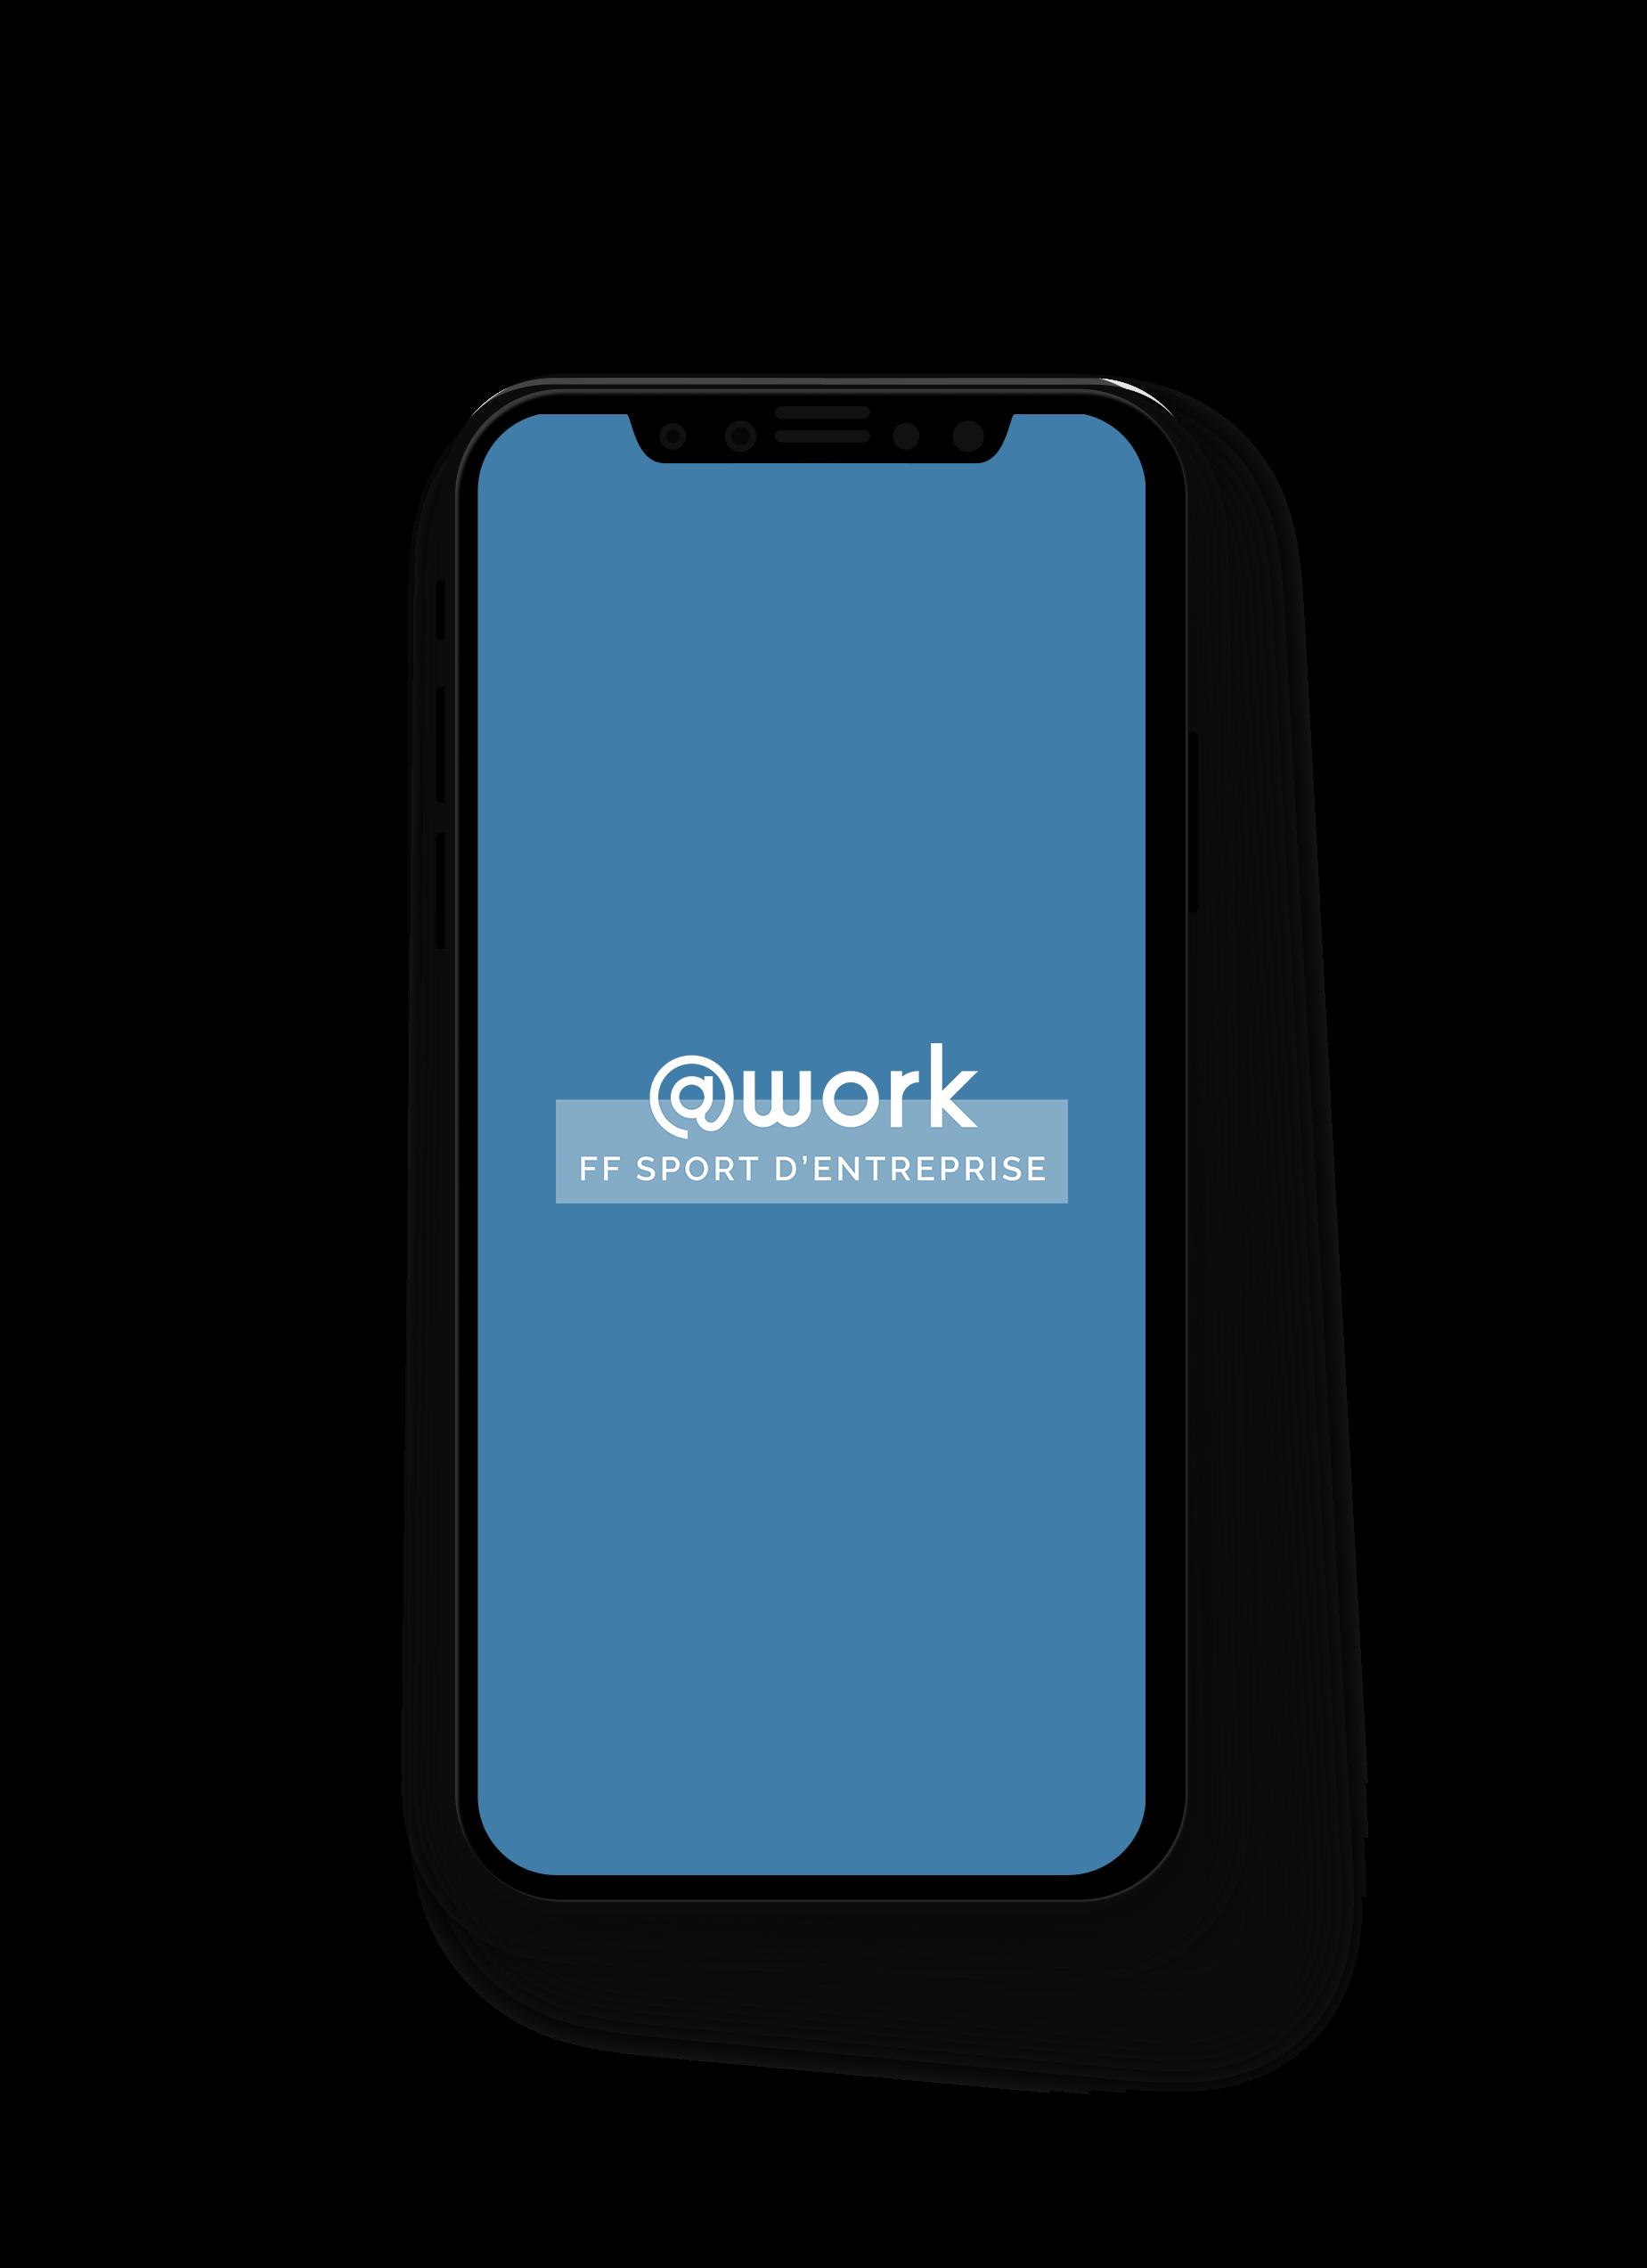 iphone mockup (4) (5)